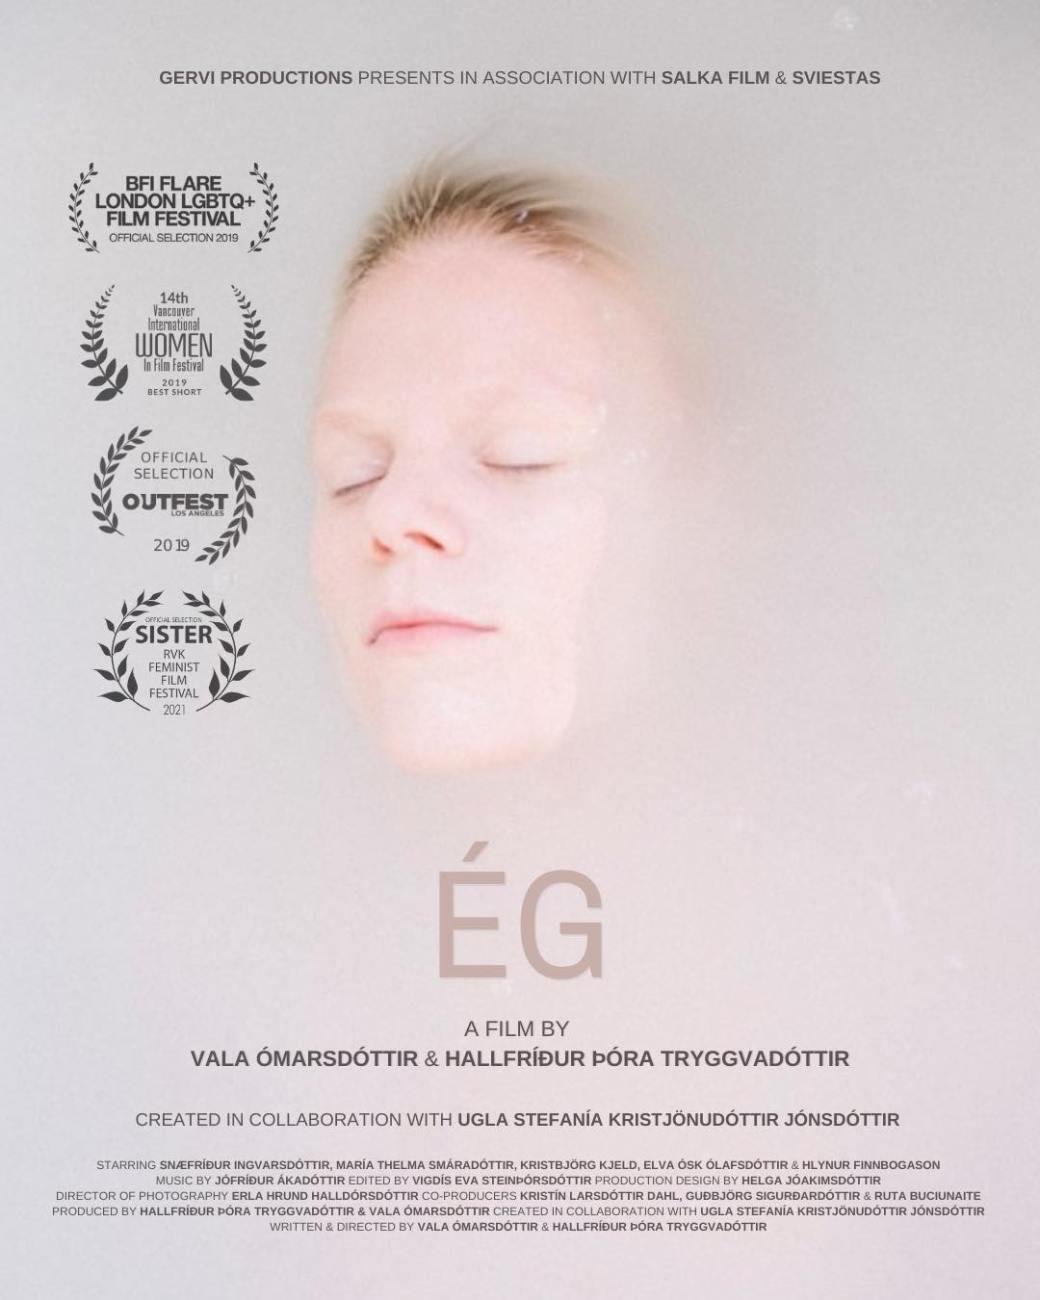 ecc81g-poster.jpg